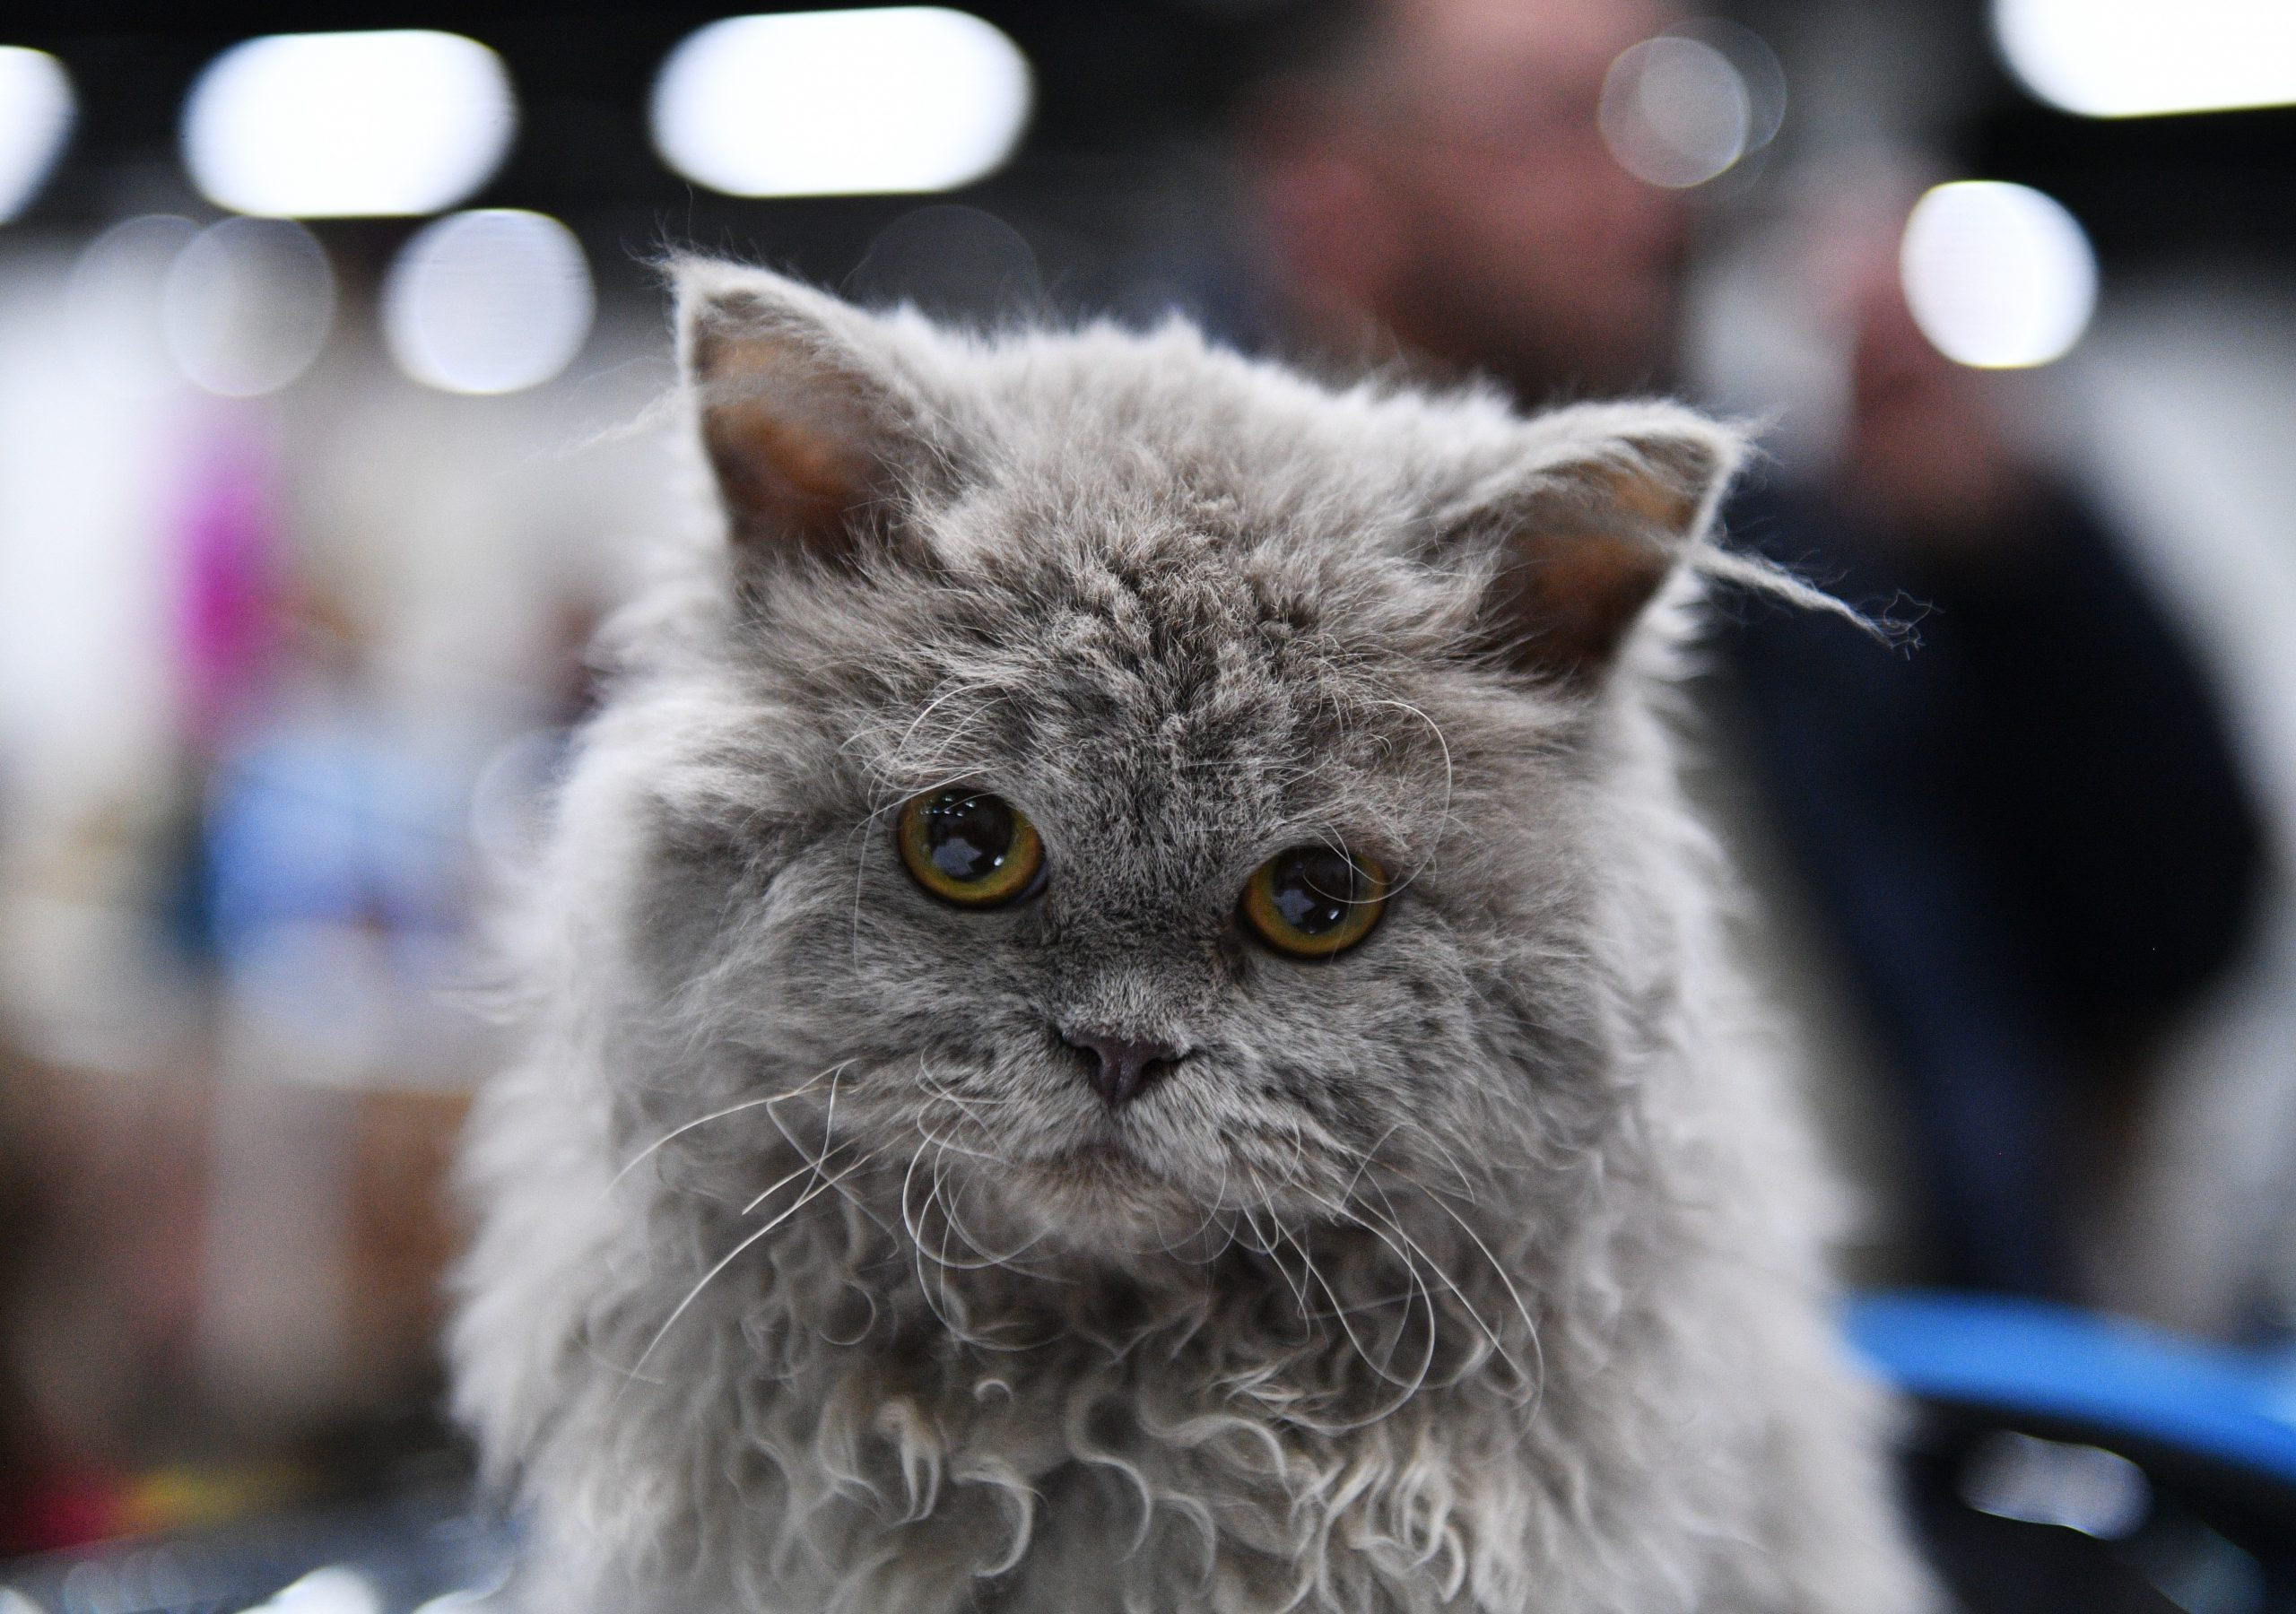 A selkirk rex kitten